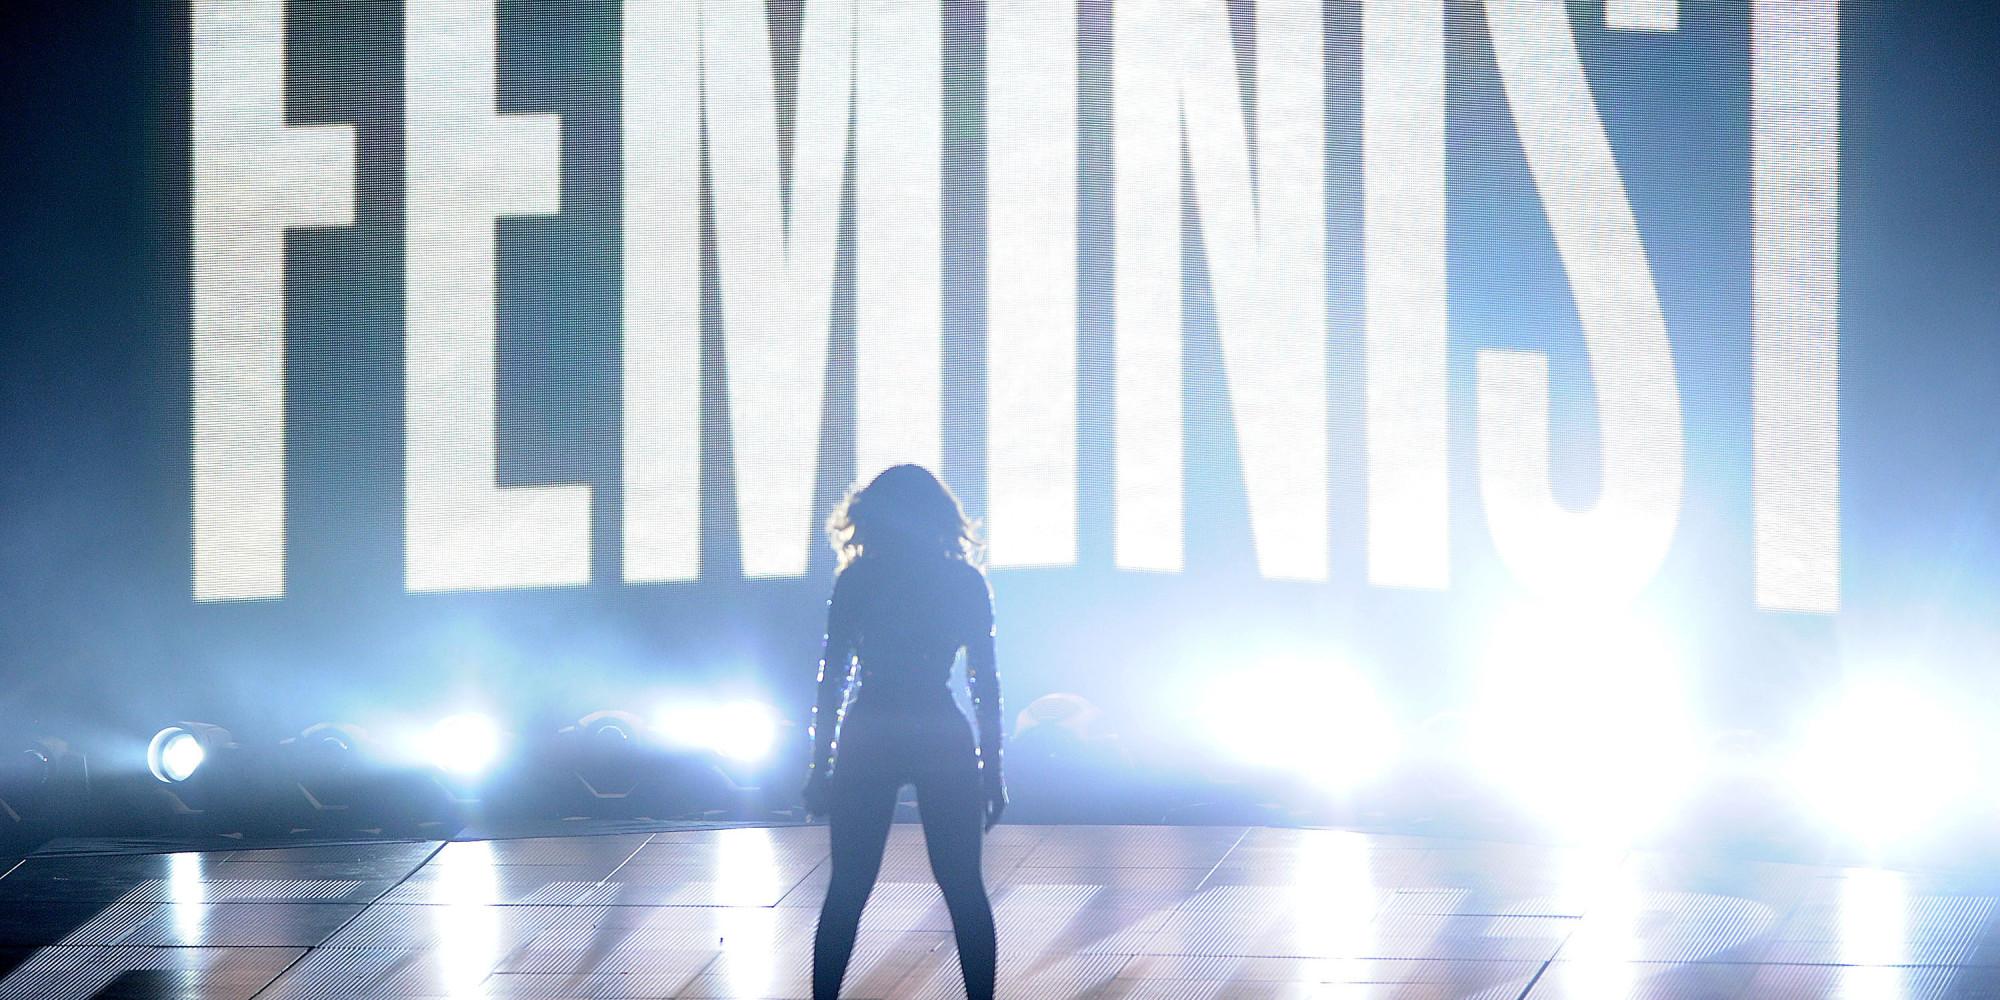 Emma Watson denies 'hypocritical' criticism of Beyoncé's feminism, posts original quotes in context